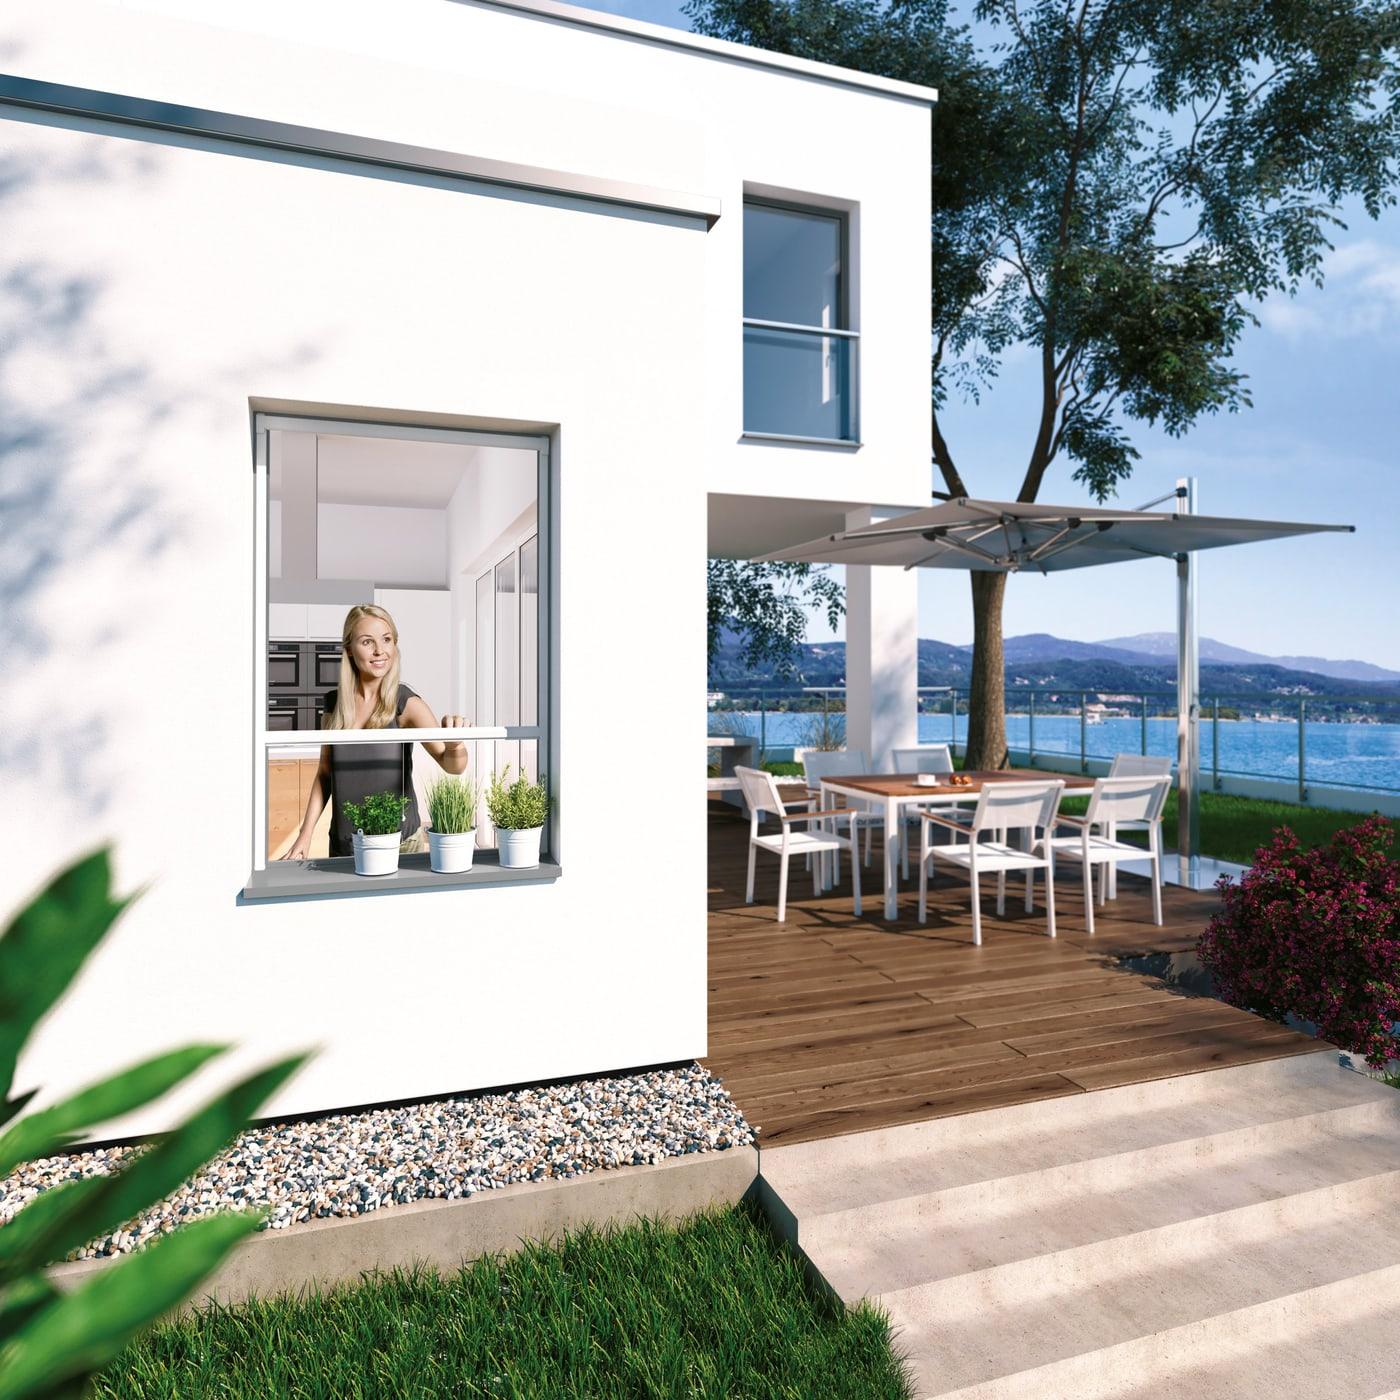 windhager insektenschutz rollo fenster 100x160cm alu migros. Black Bedroom Furniture Sets. Home Design Ideas